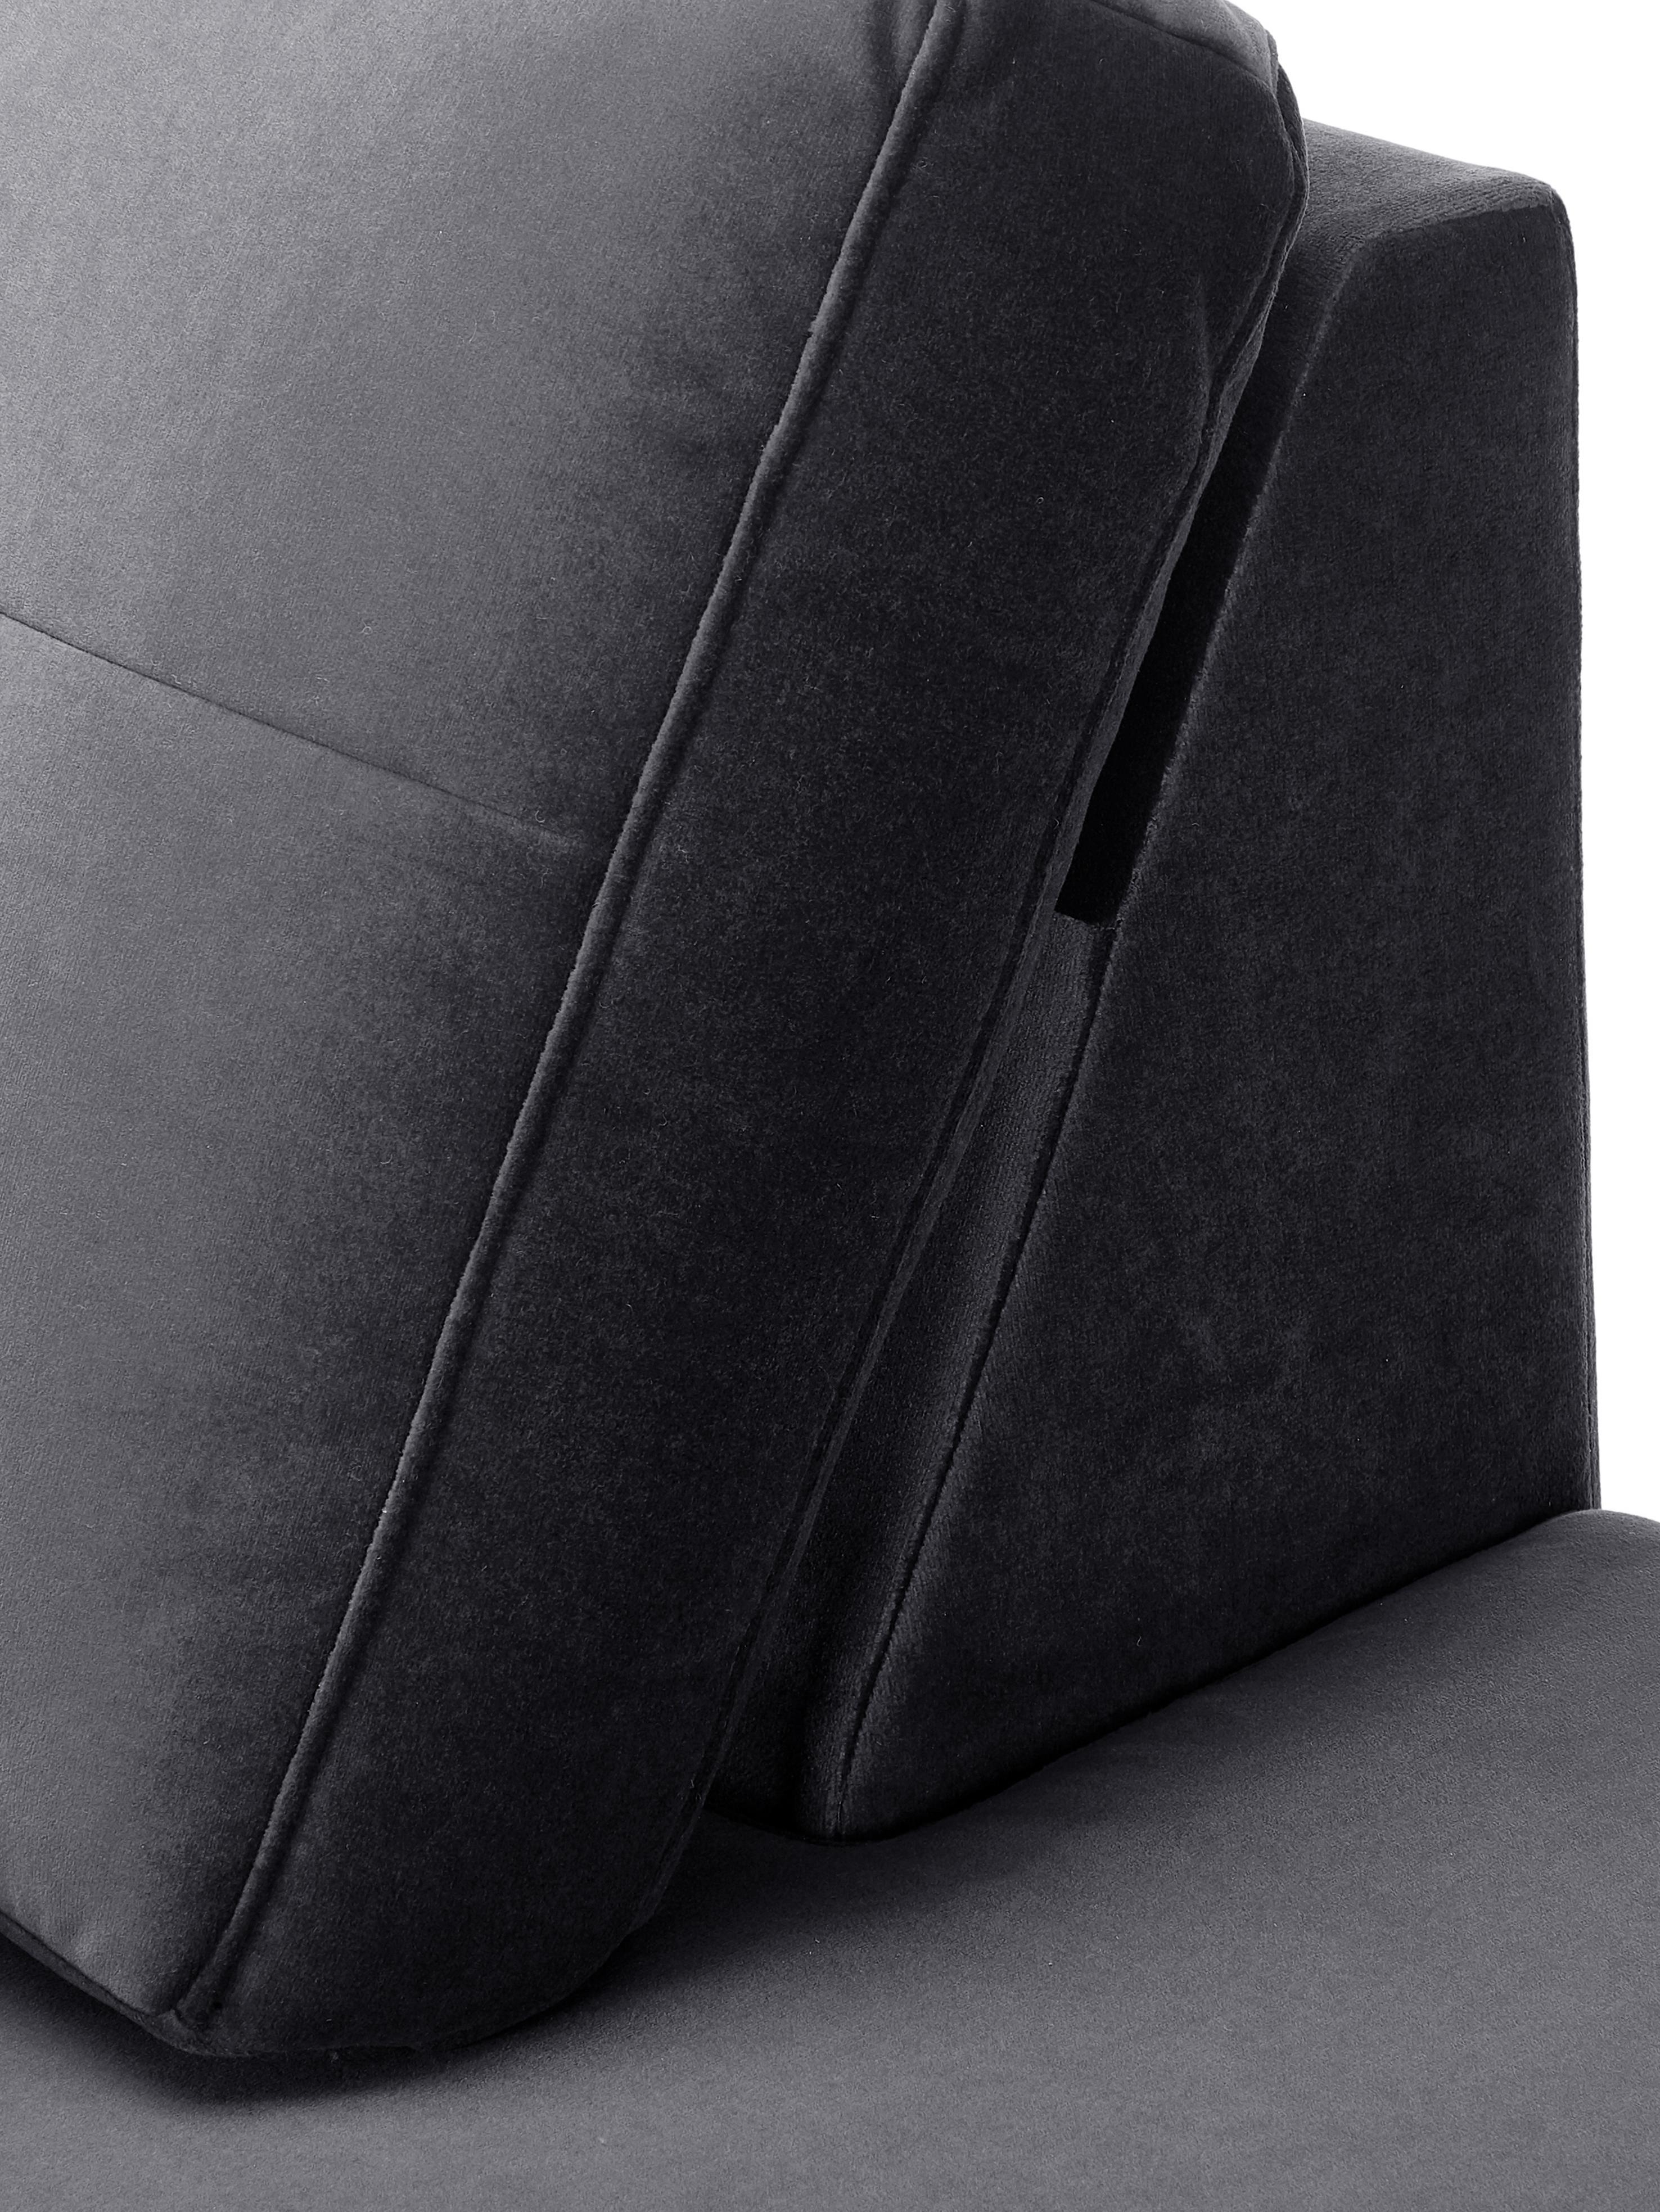 Samt-Ottomane Alva, Bezug: Samt (Hochwertiger Polyes, Gestell: Massives Kiefernholz, Füße: Massives Buchenholz, gebe, Samt Dunkelgrau, B 193 x T 94 cm